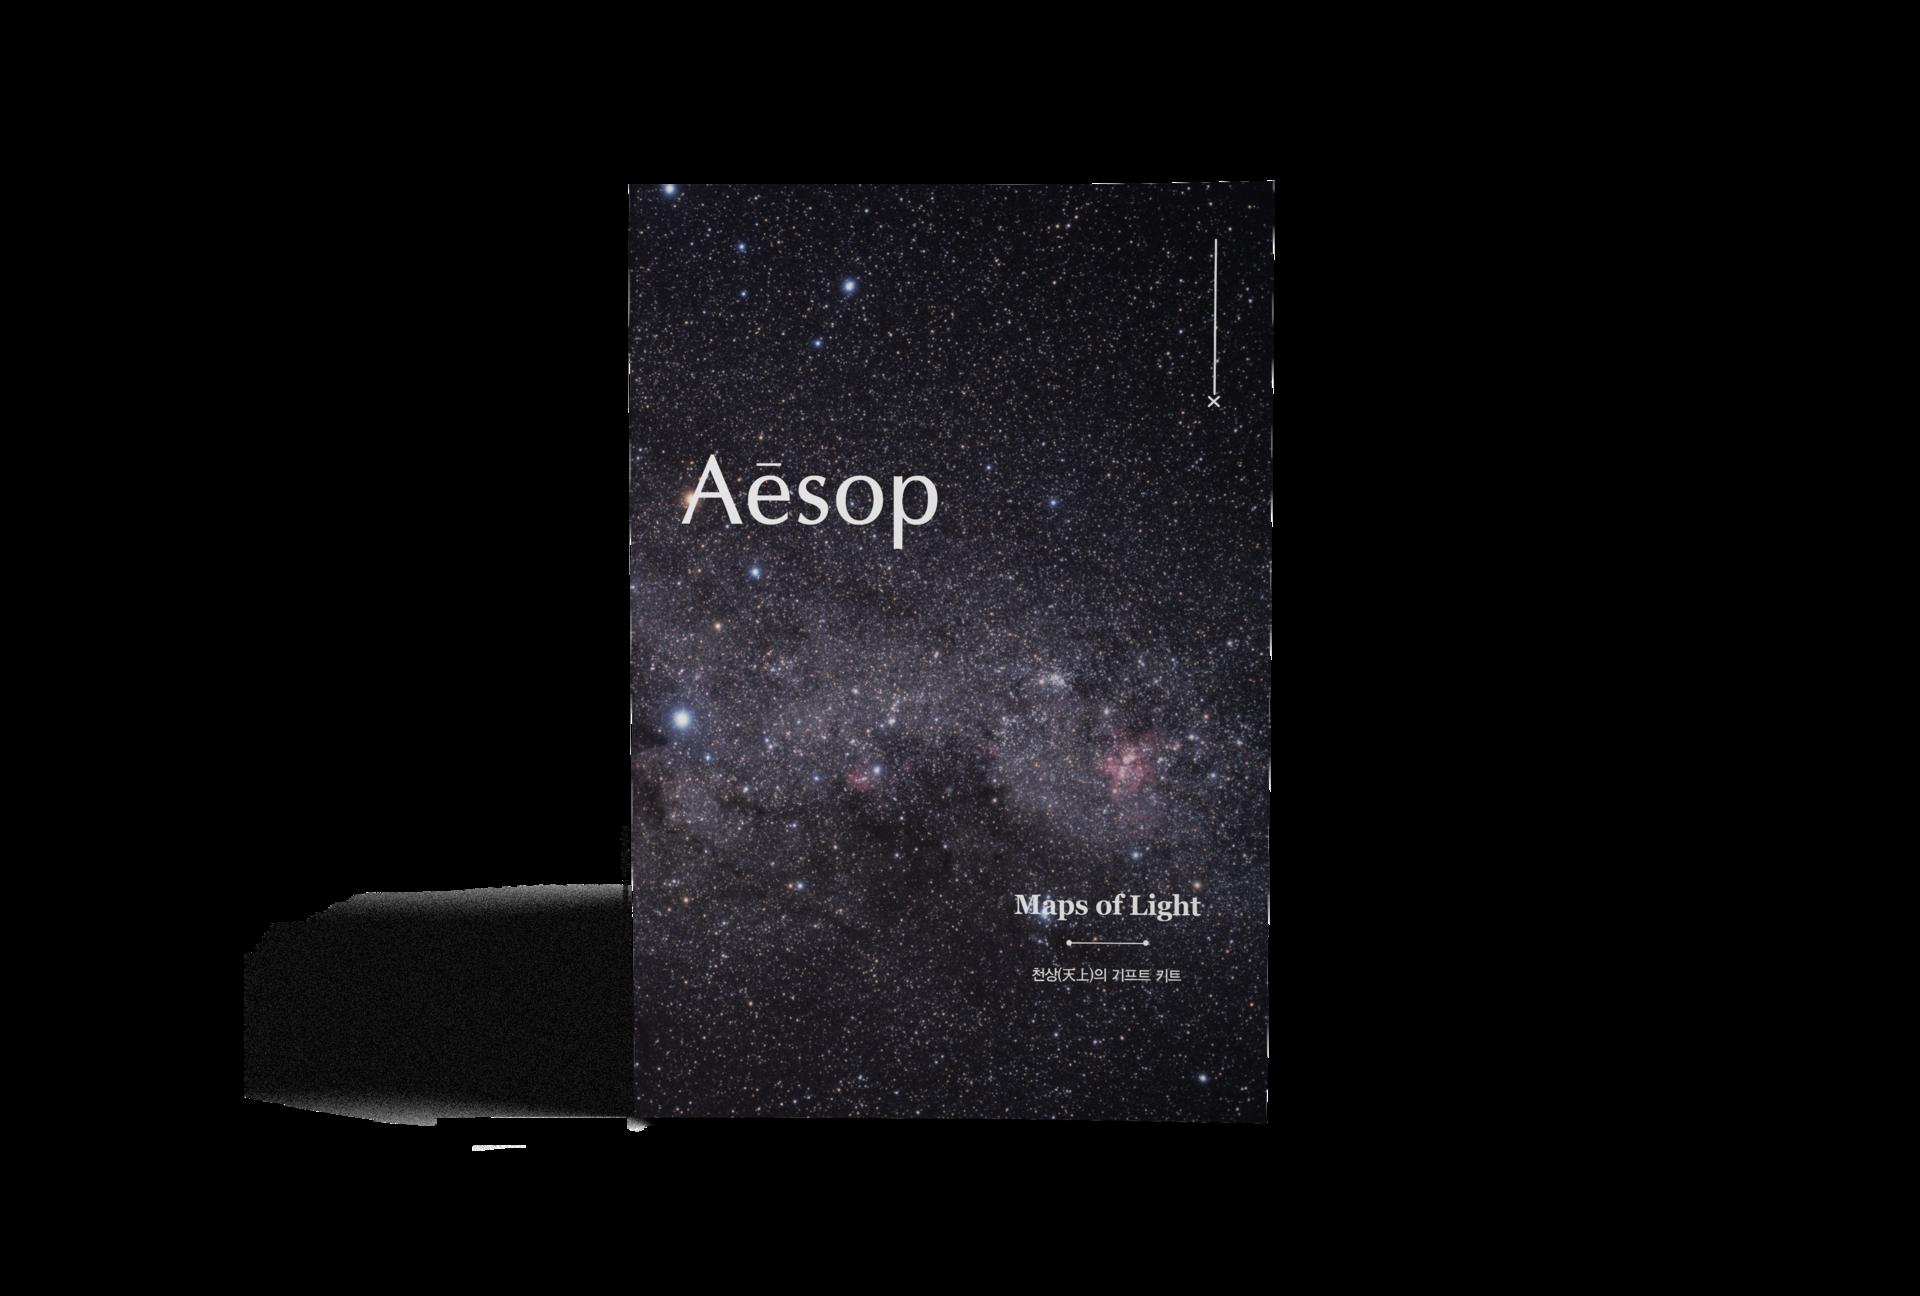 AESOP / Maps of Light